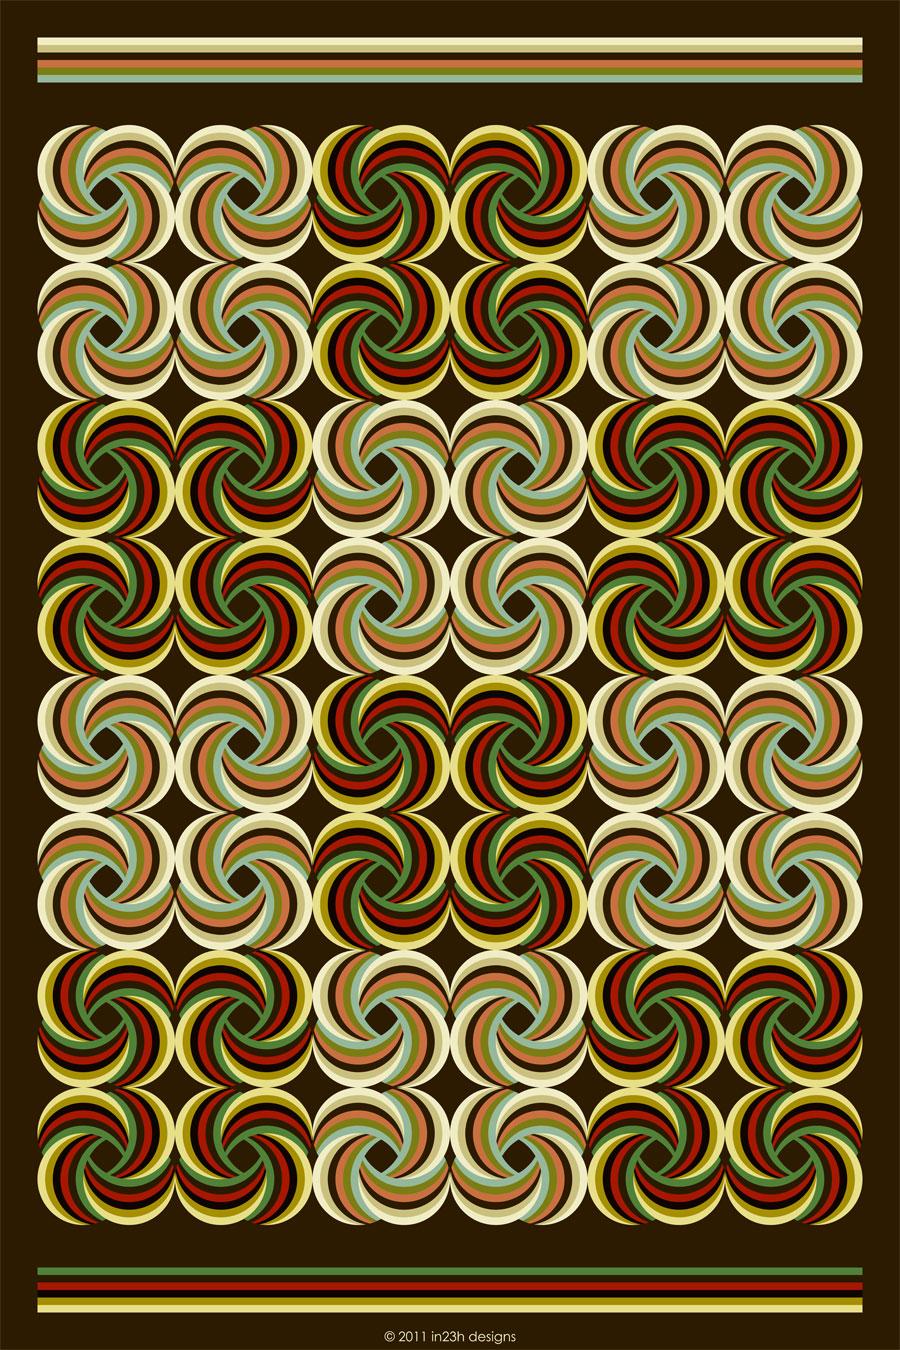 Poster 005 - Swirly